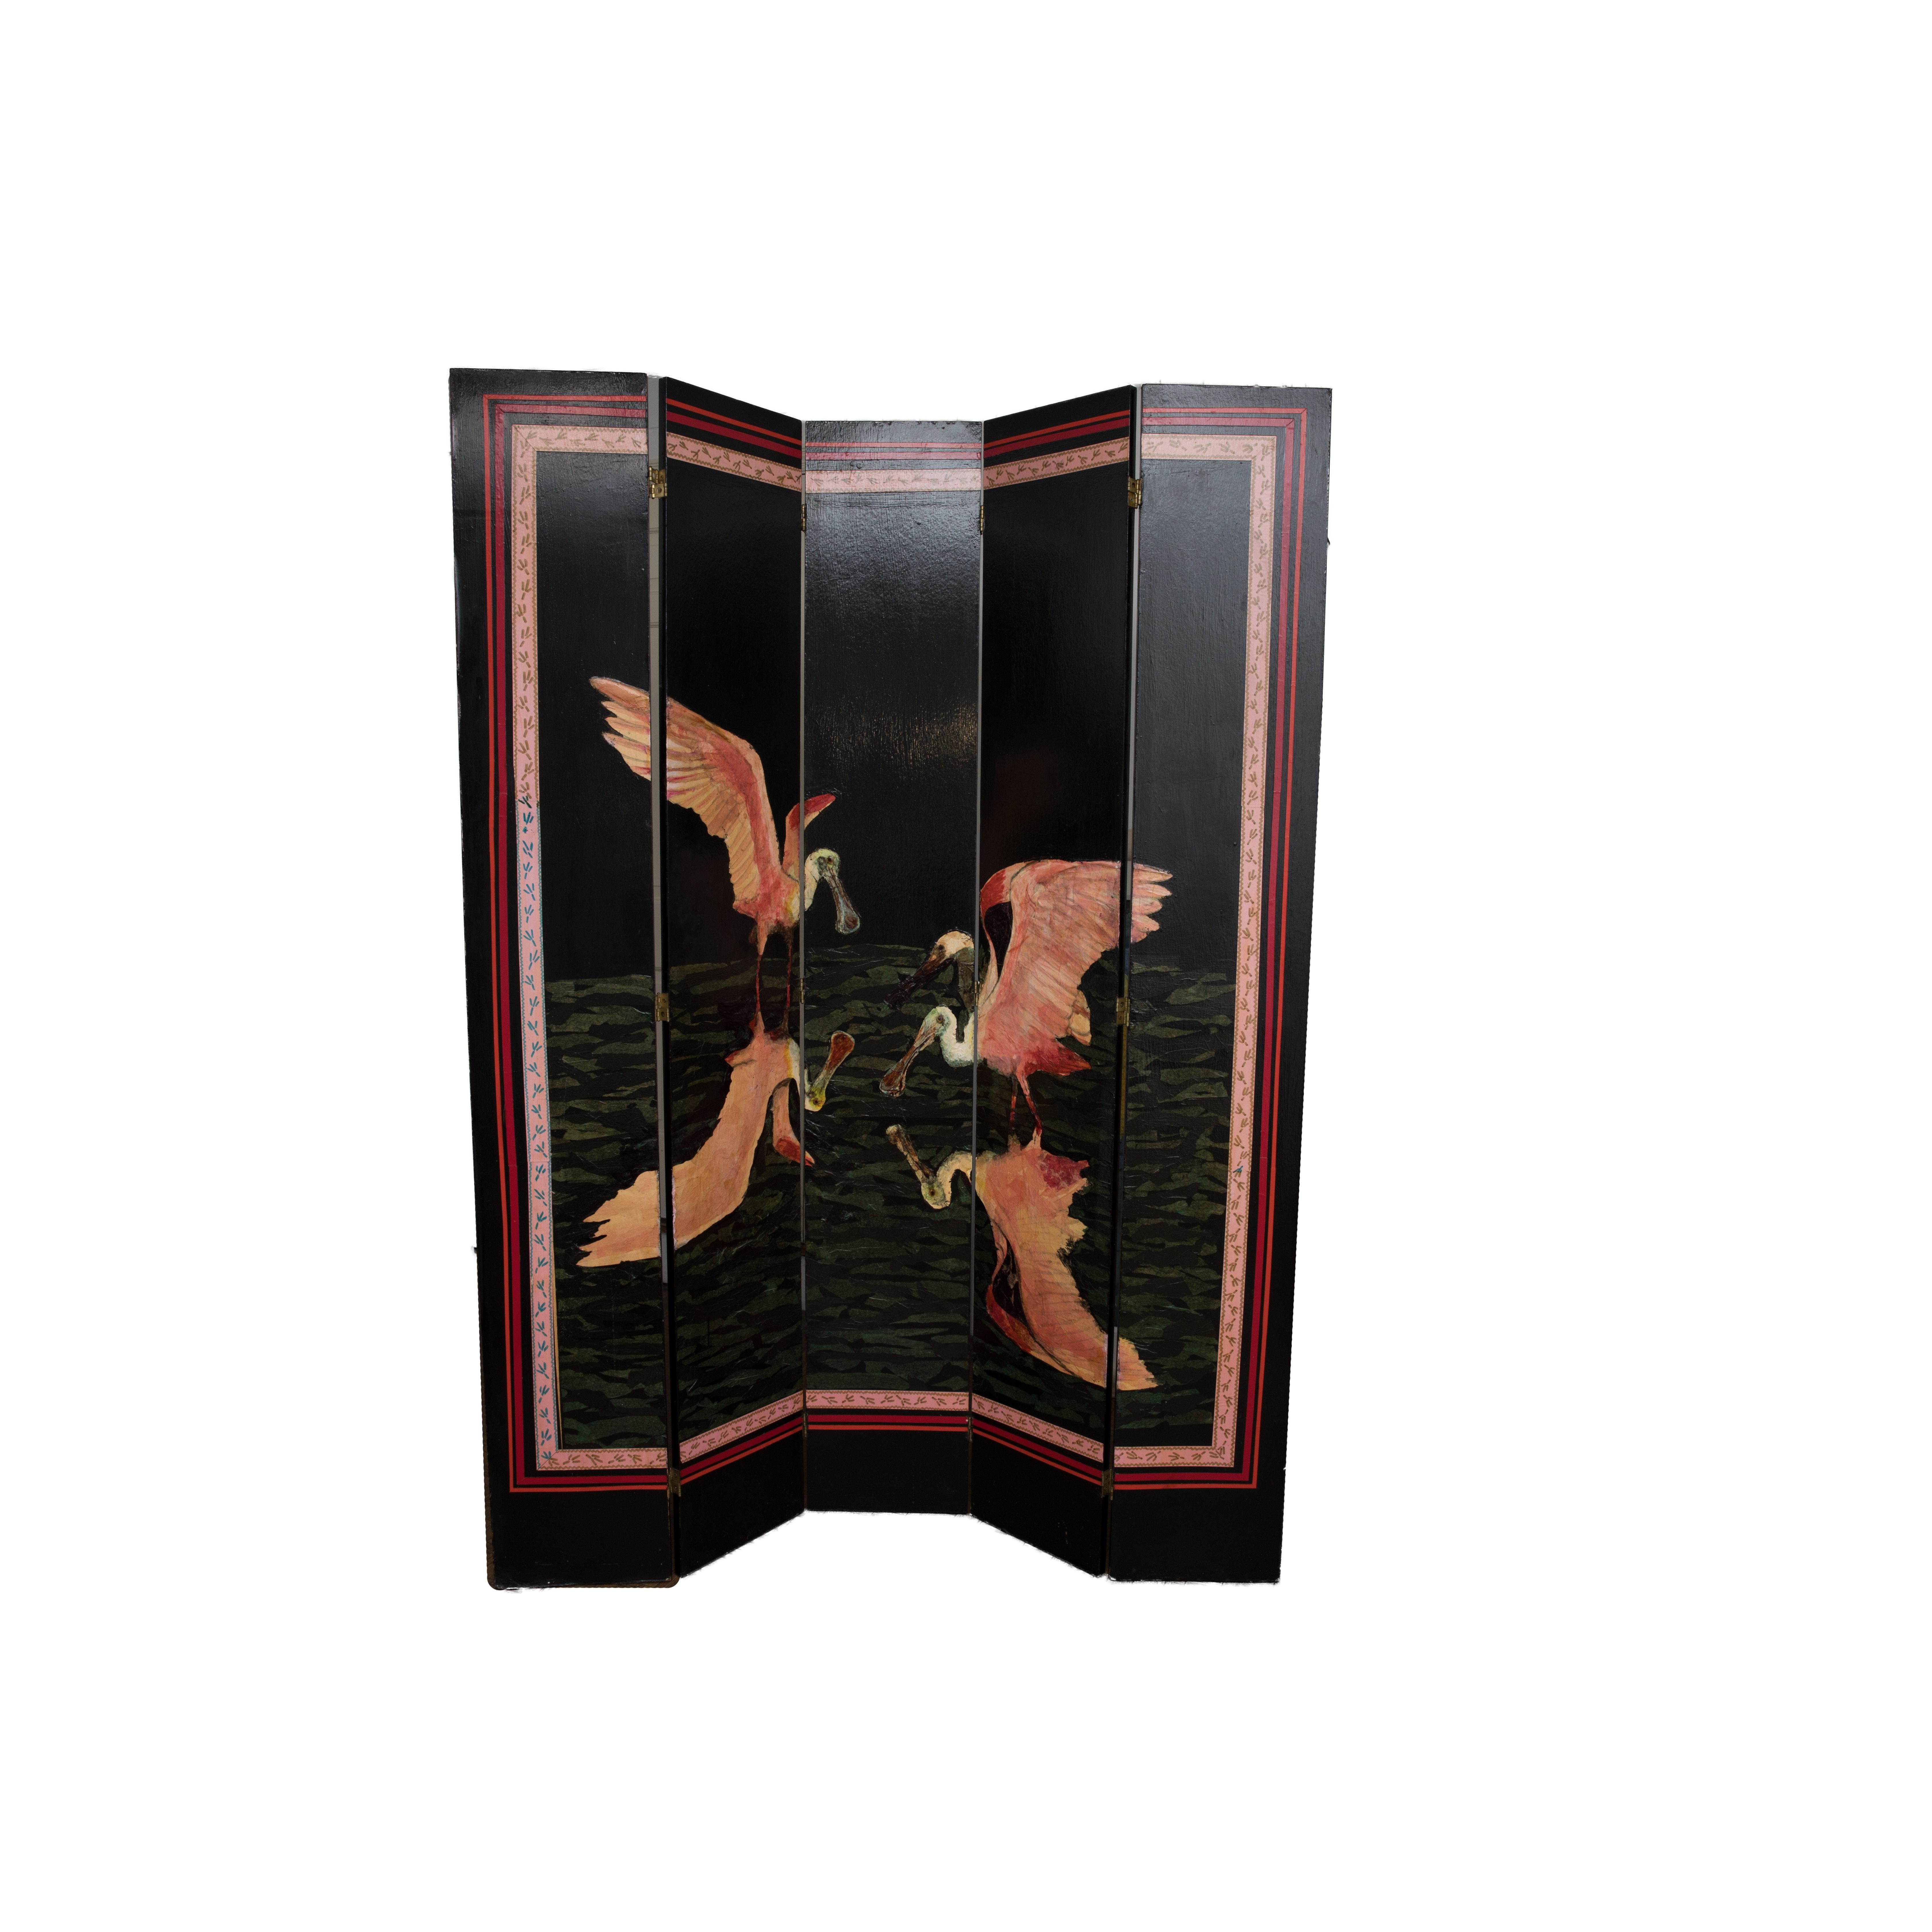 Wooden Room Divider with Spoonbill Bird Design